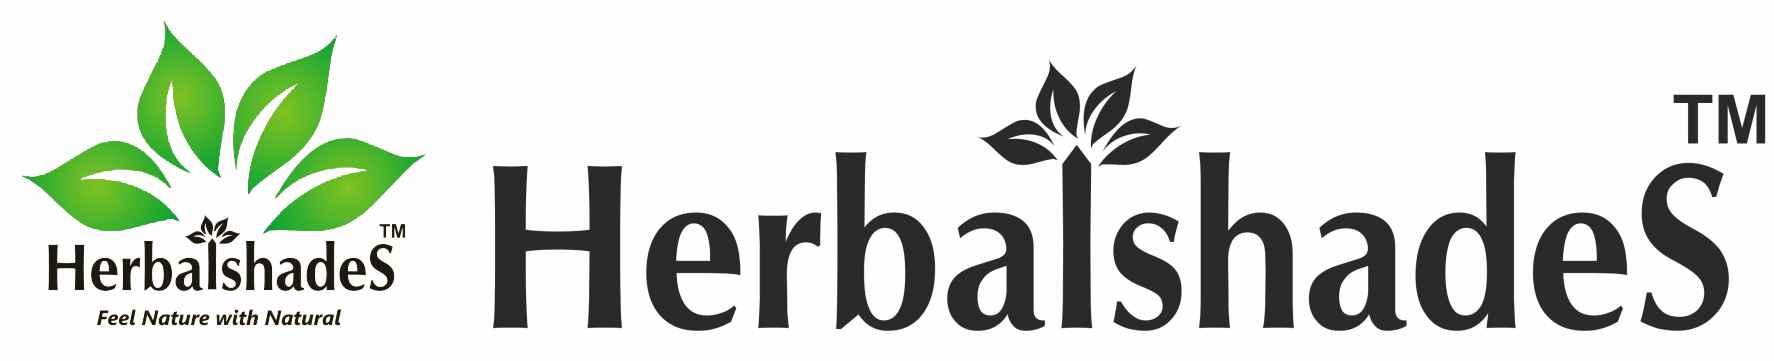 HerbalshadeS